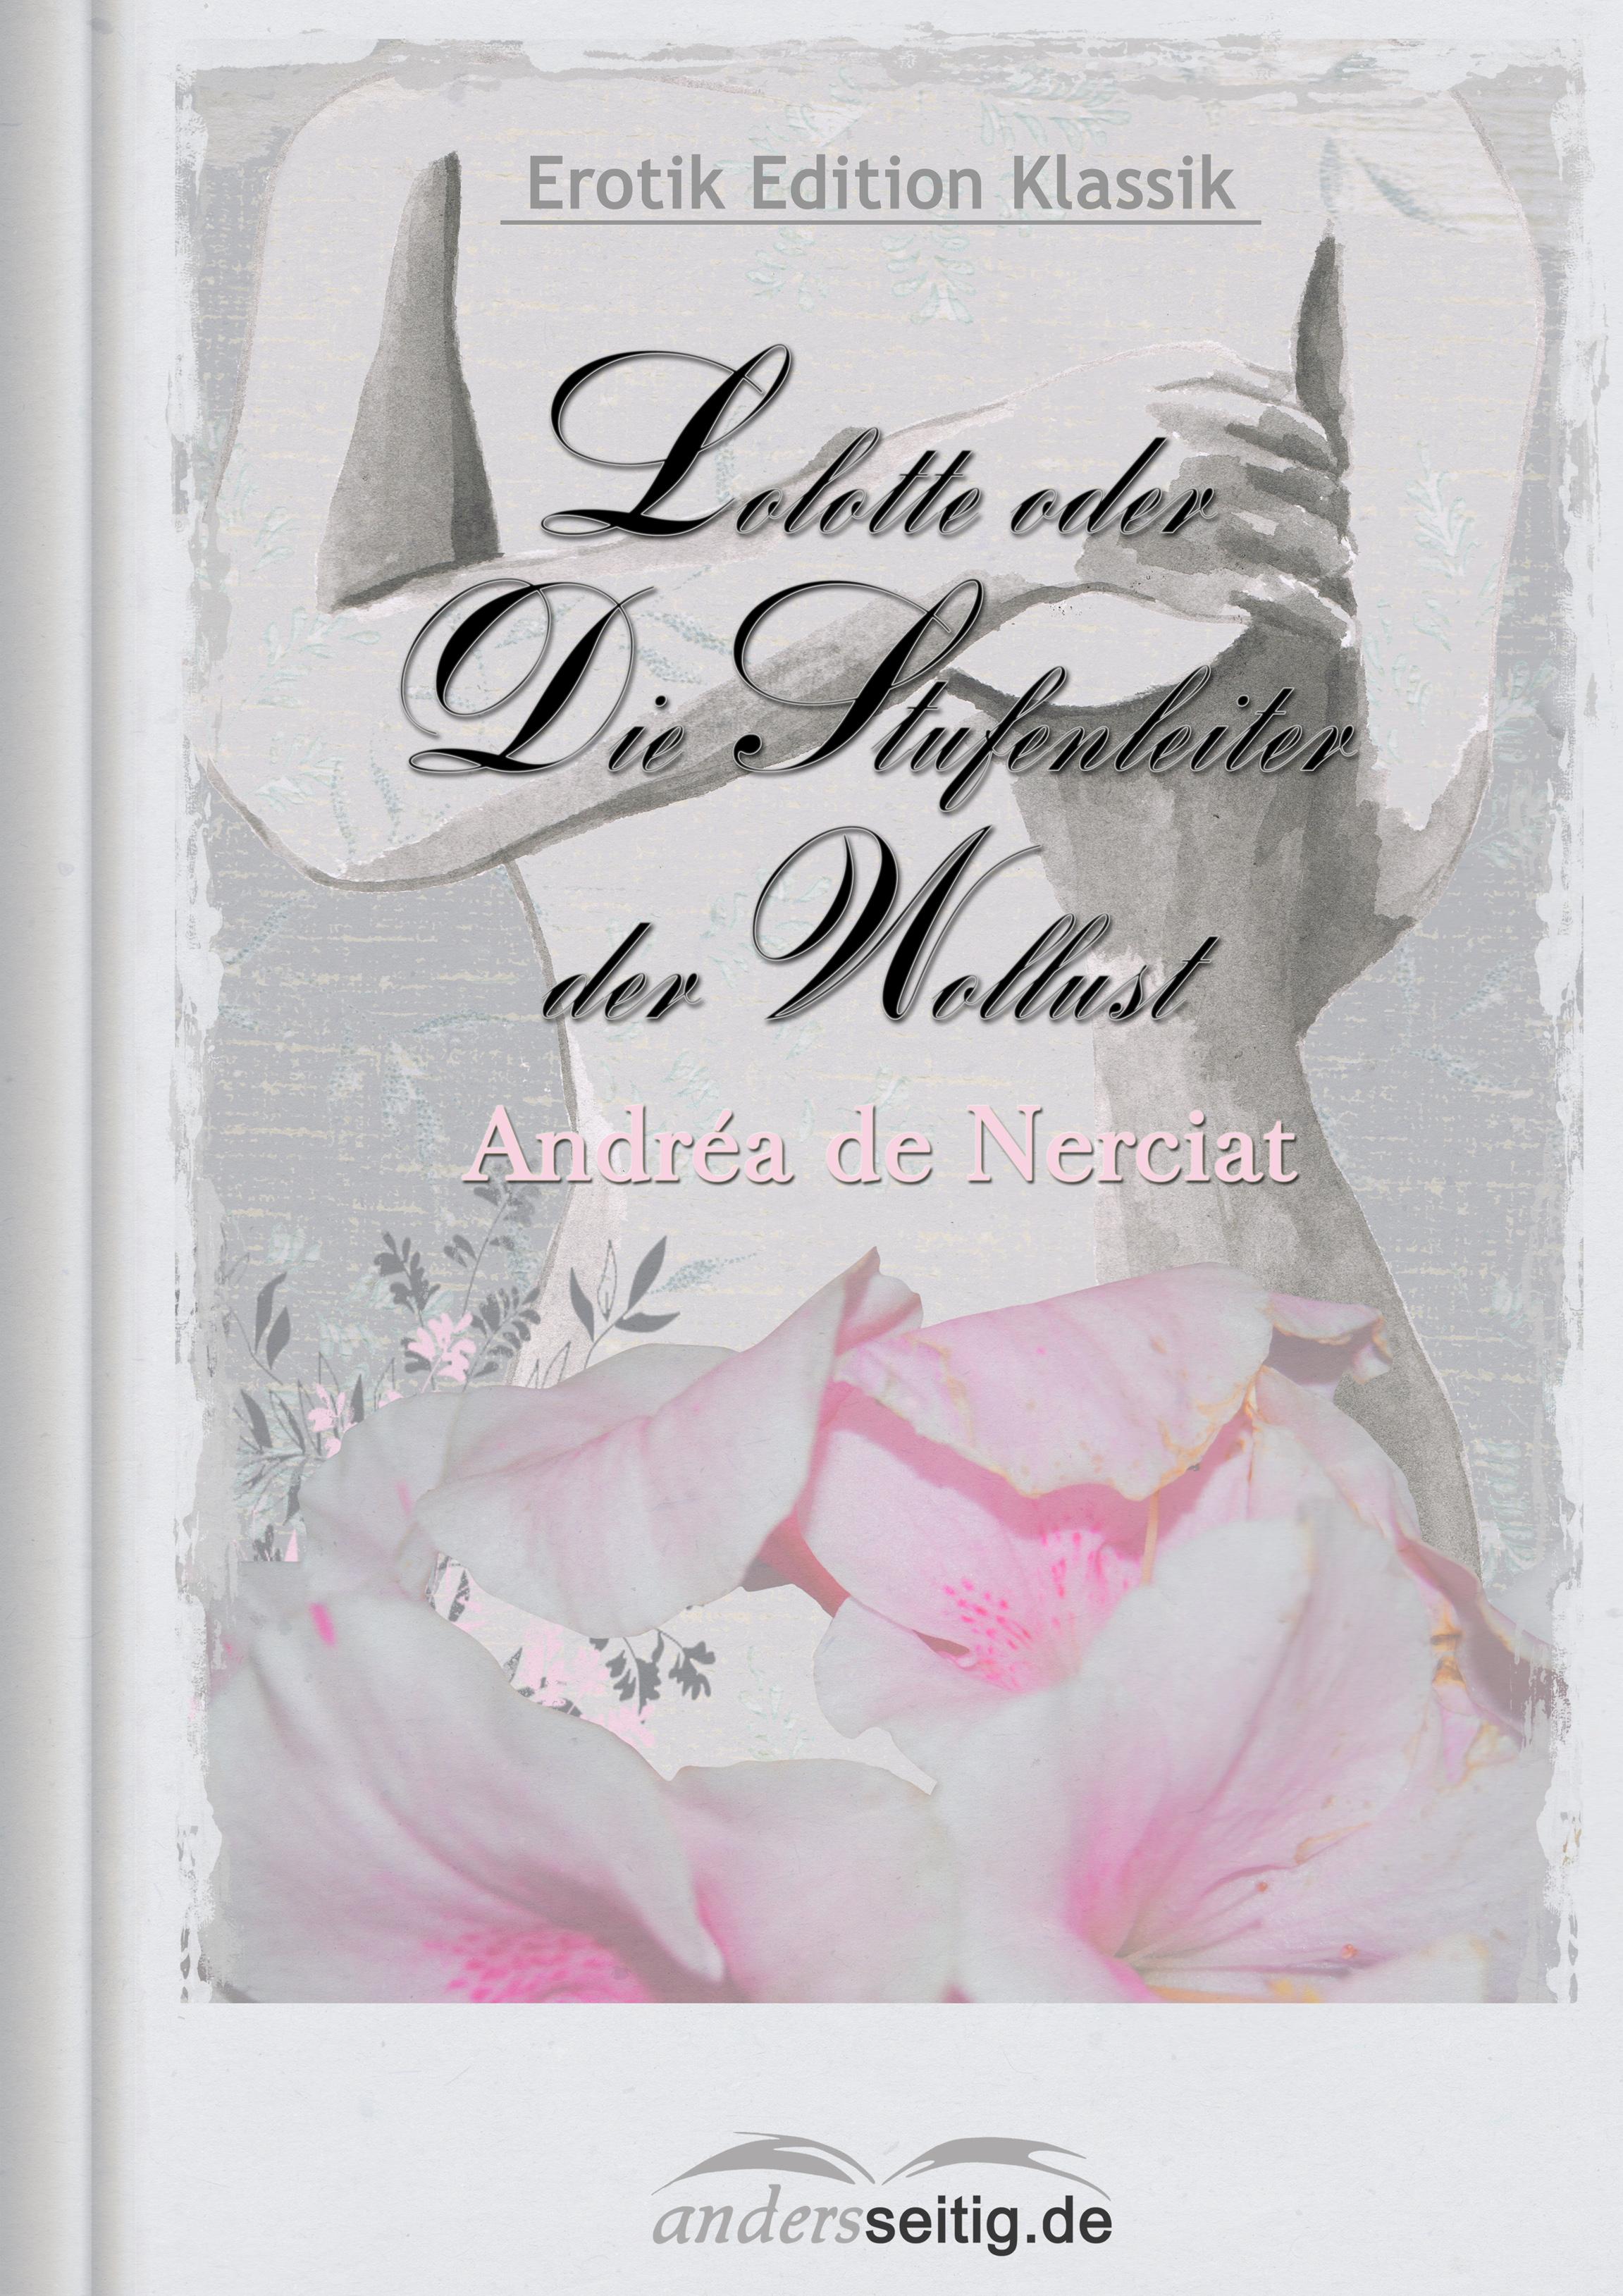 Andréa de Nerciat Lolotte oder Die Stufenleiter der Wollust недорого